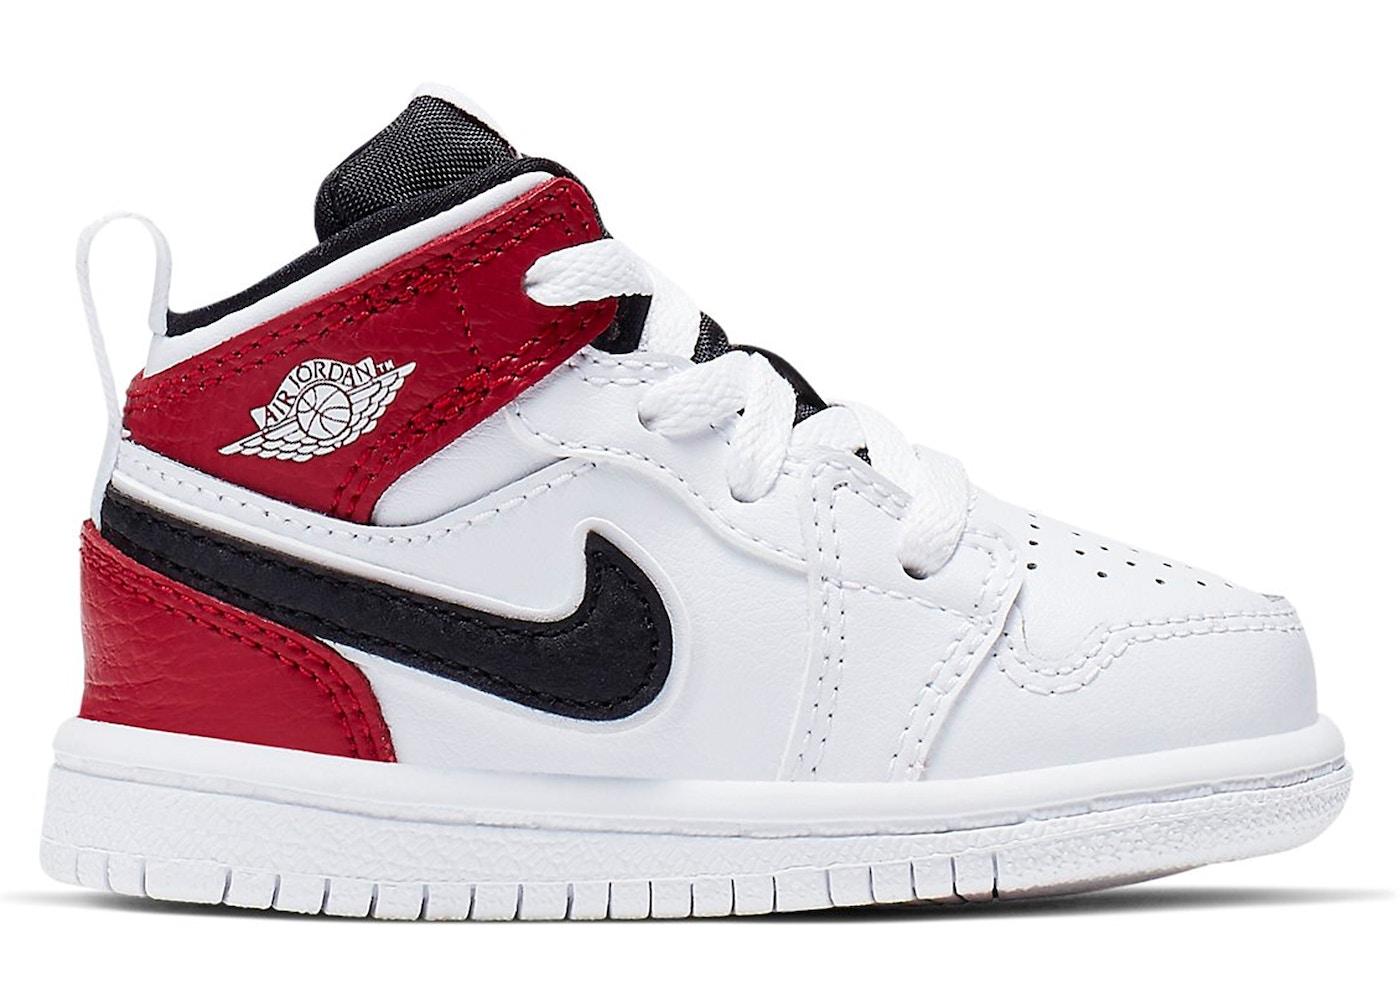 Jordan 1 Mid White Black Gym Red Td 640735 116